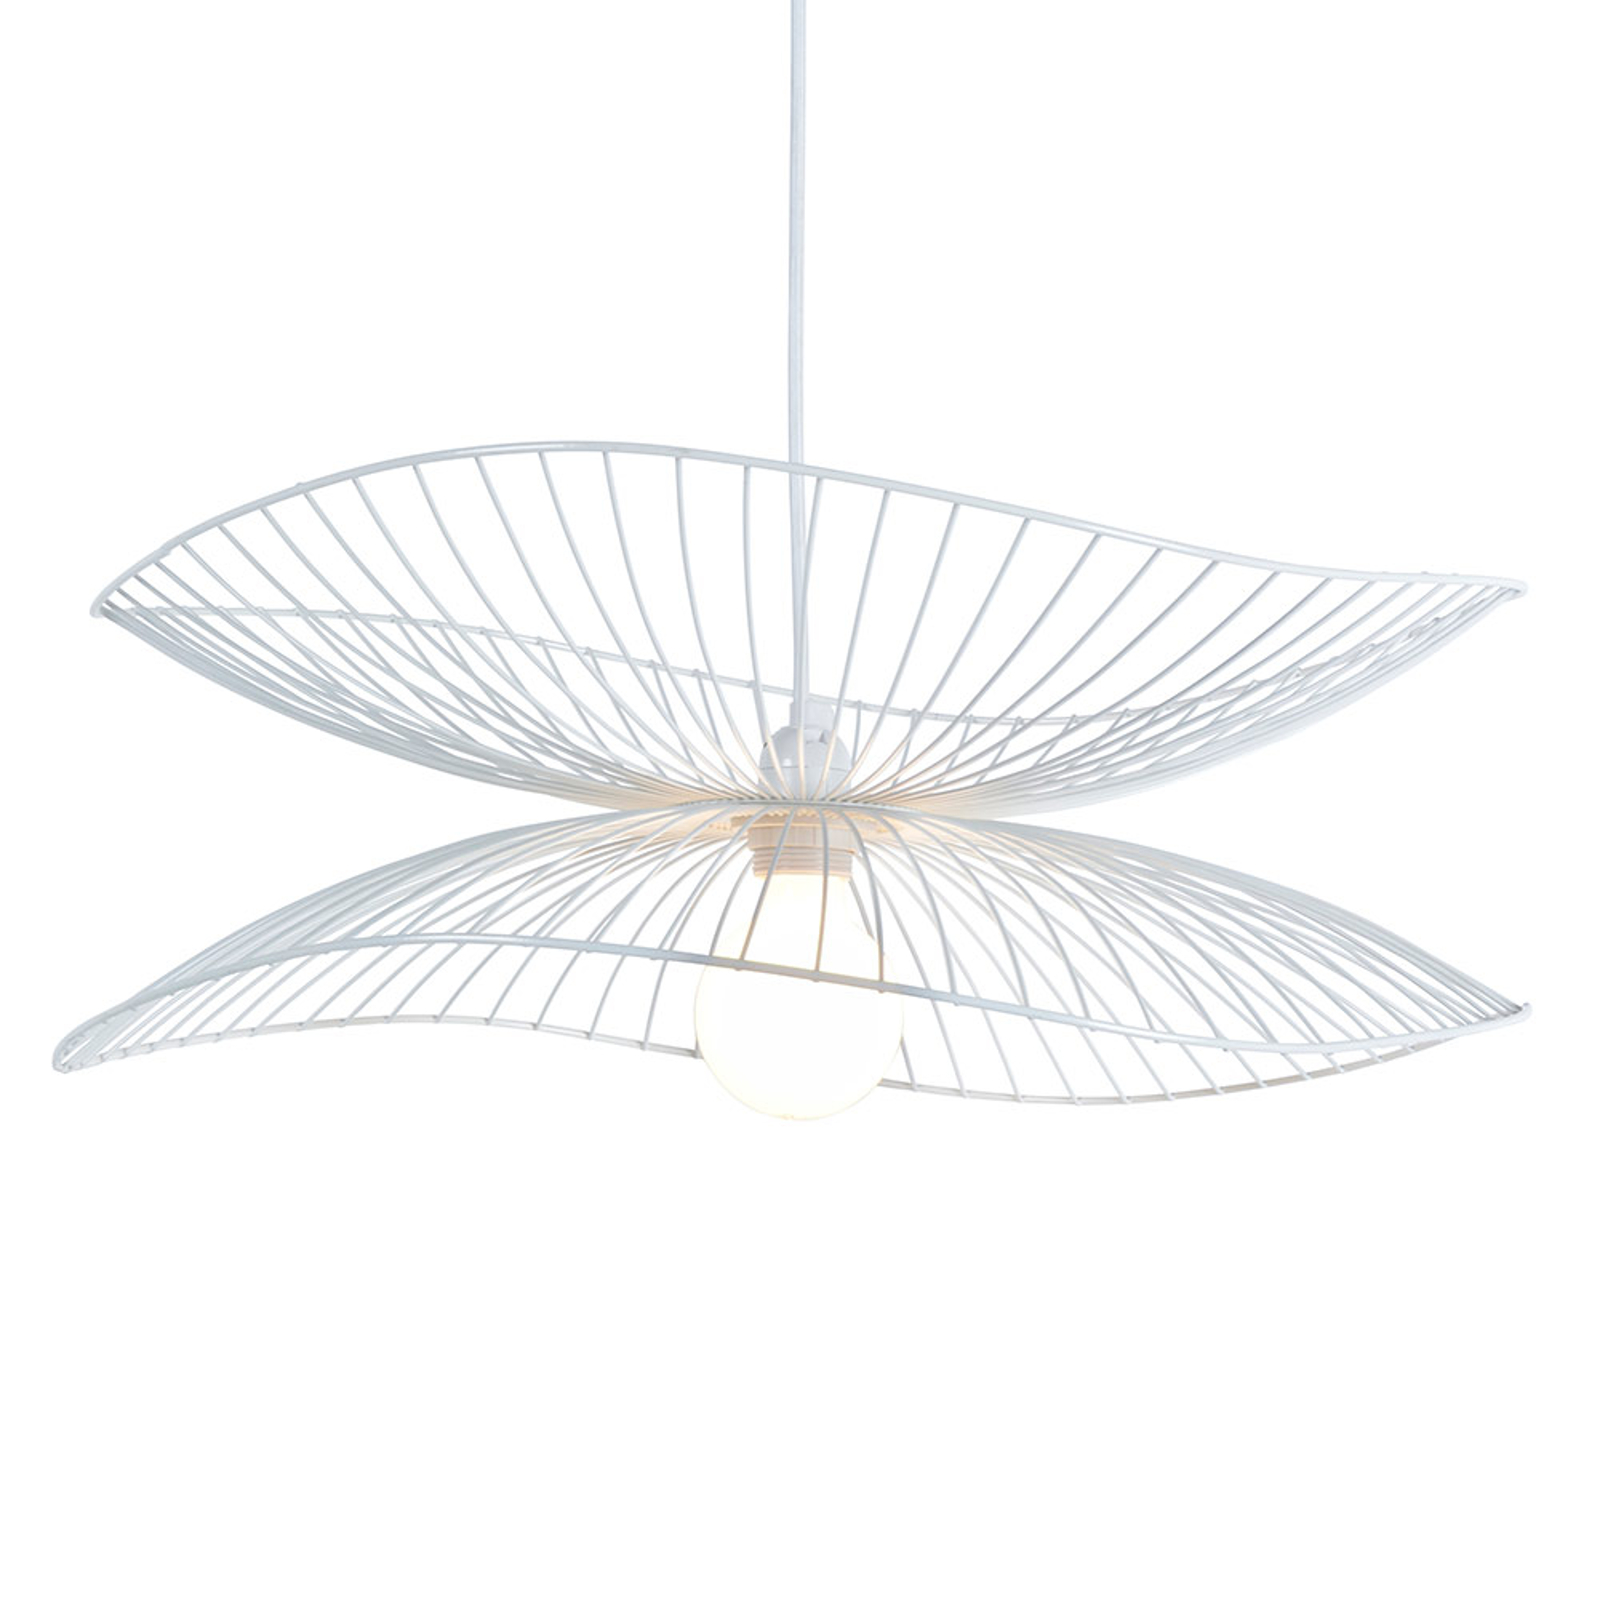 Forestier Lillebule S lampa wisząca, 56 cm, biała